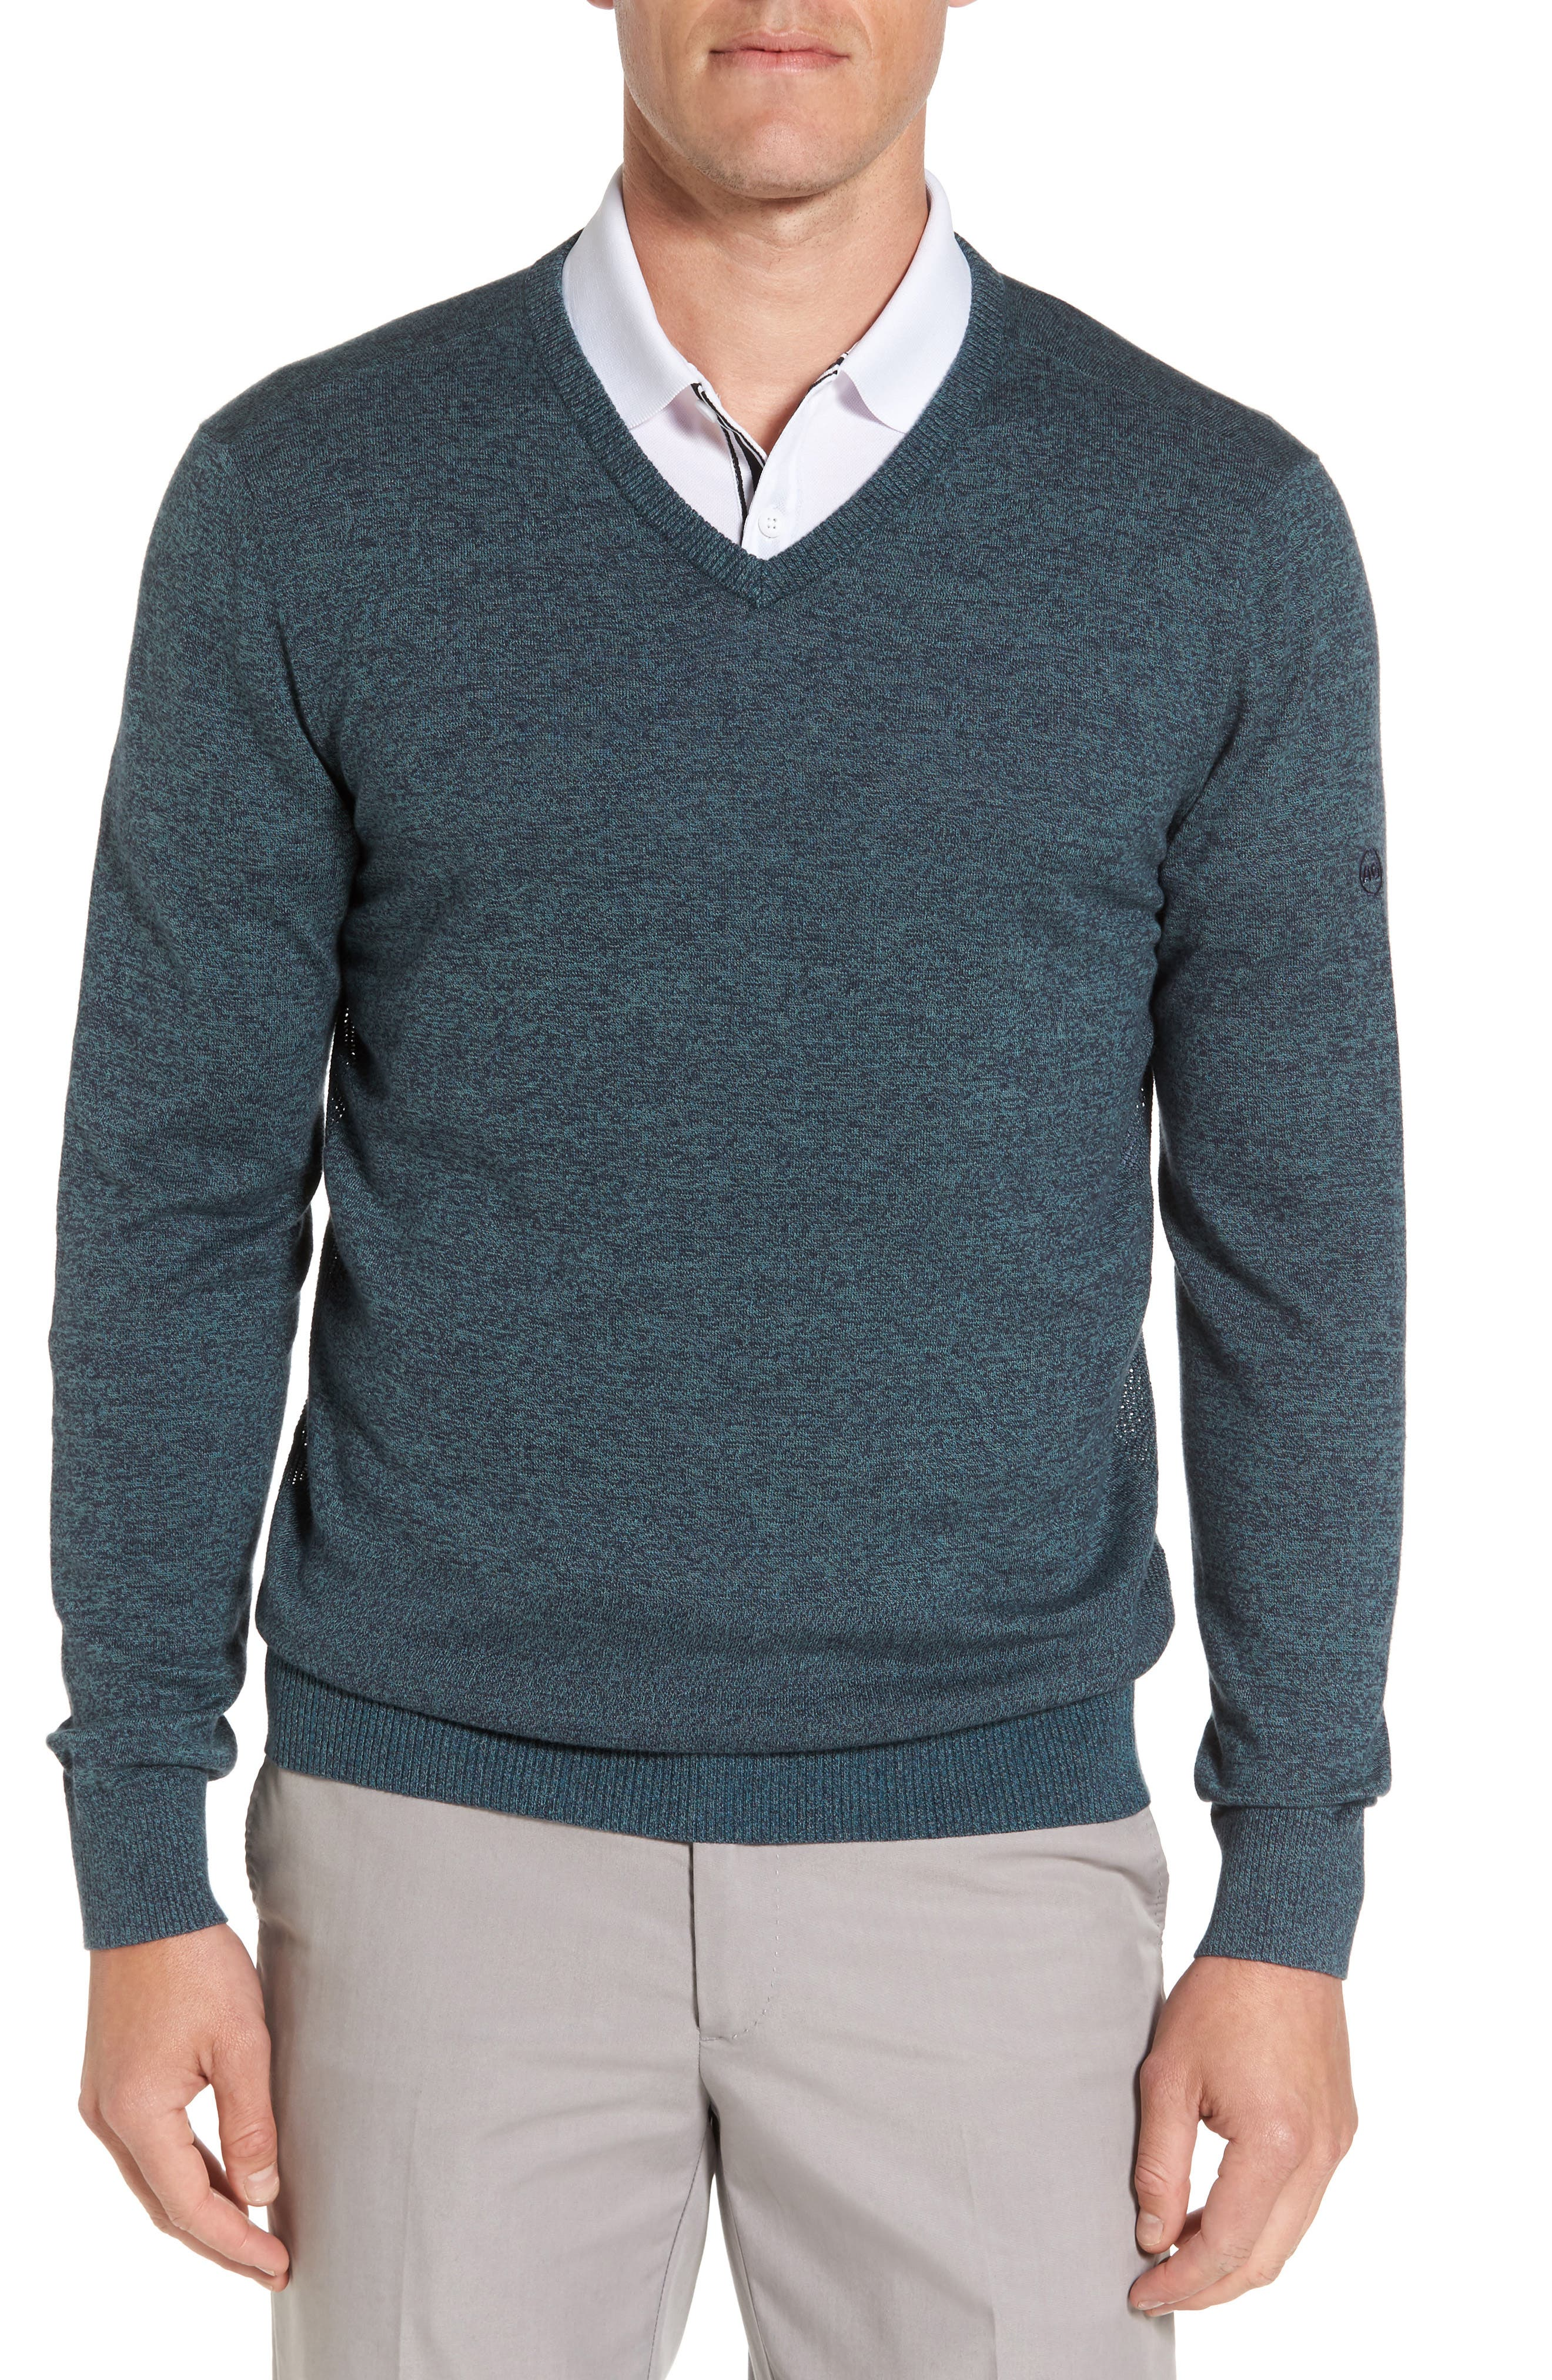 Ridgewood V-Neck Sweater,                         Main,                         color, Turf/ Naval Blue Melange